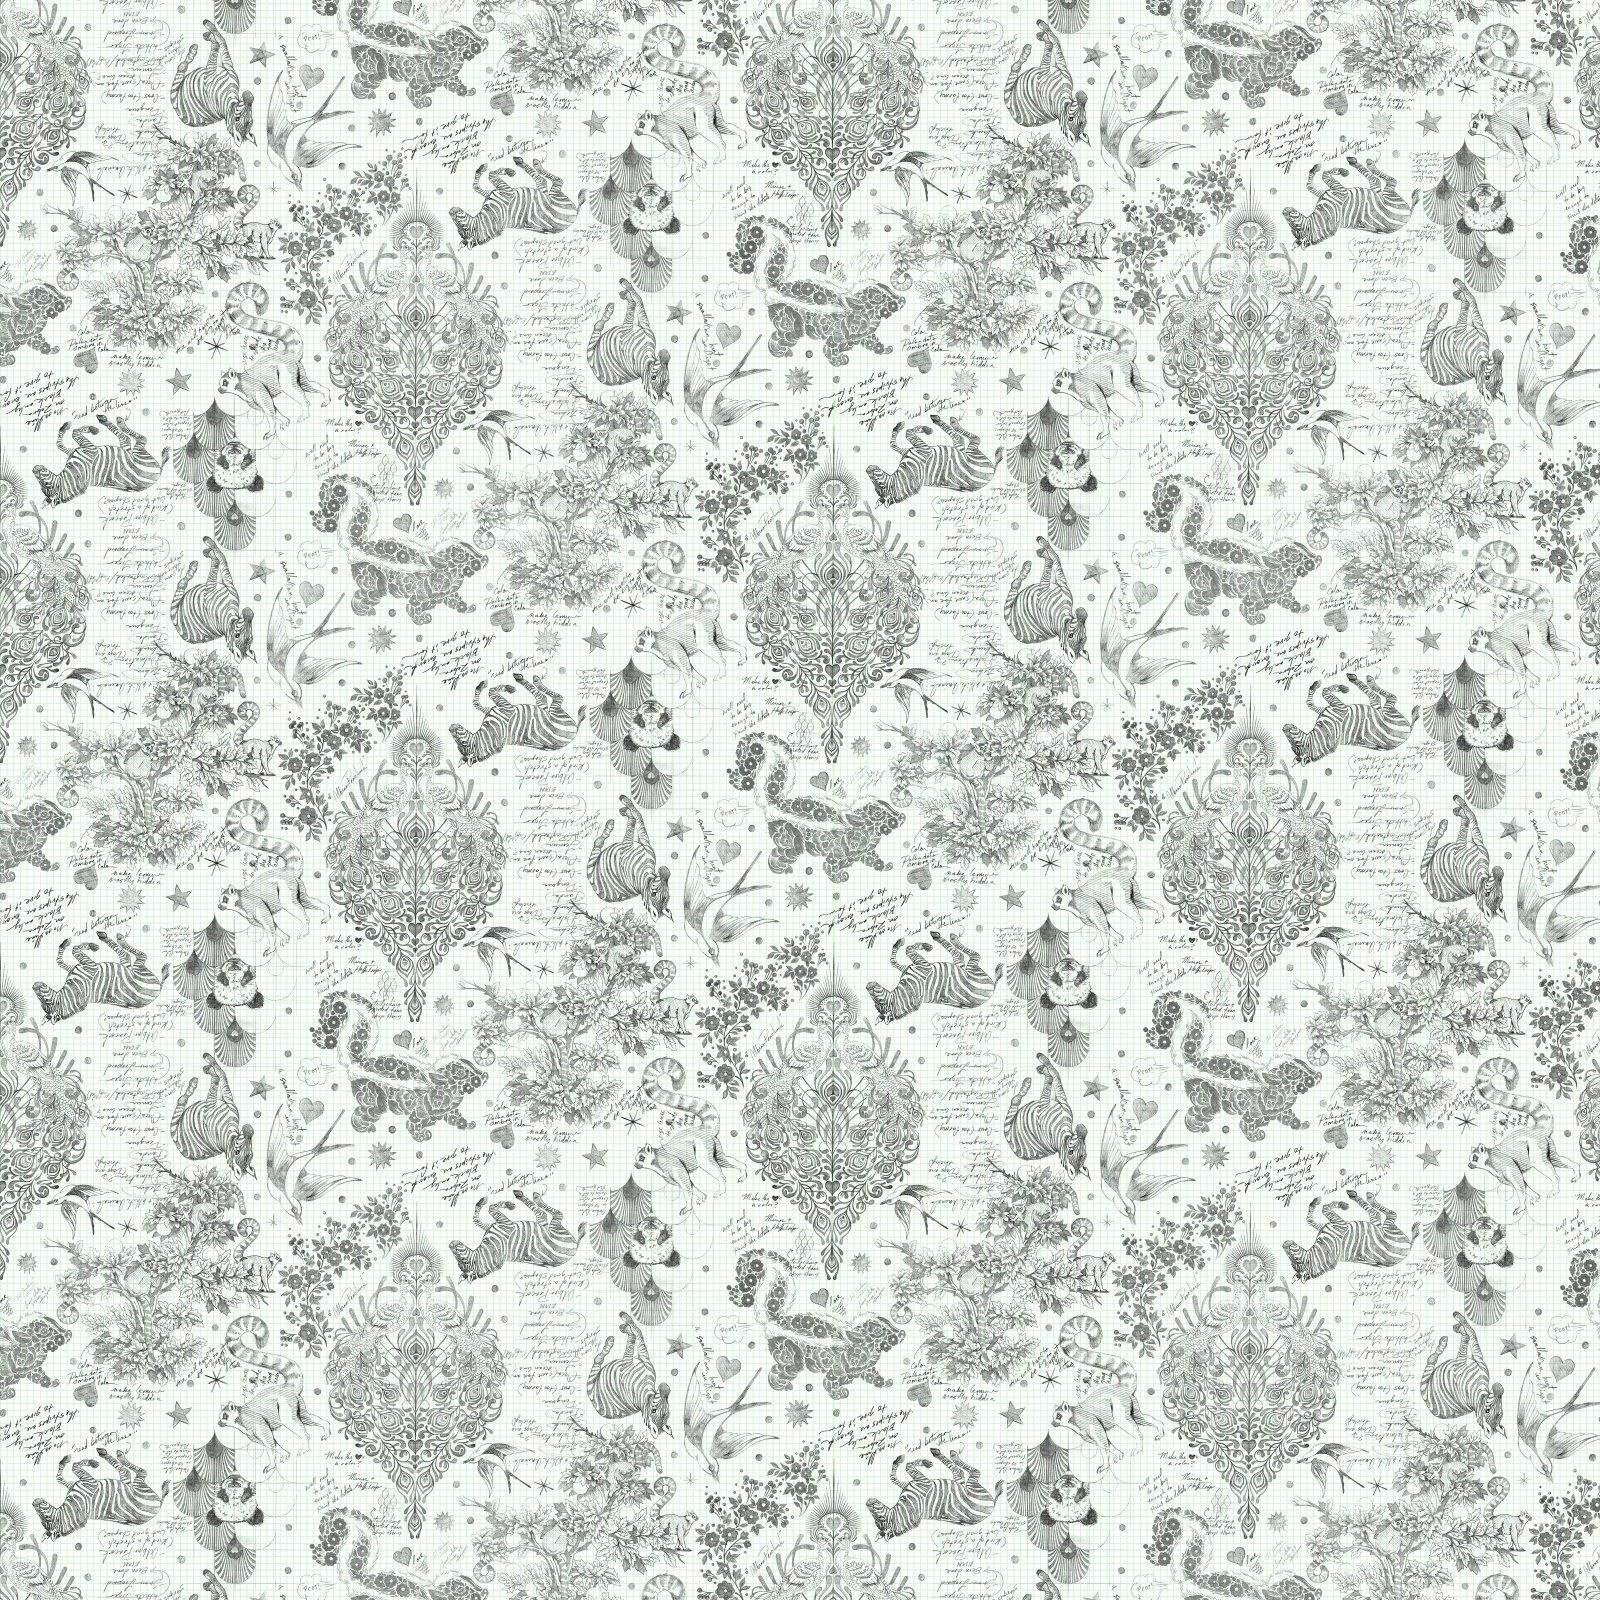 Free Spirit - Tula Pink - Linework - Sketchy in Paper - *PRE-ORDER